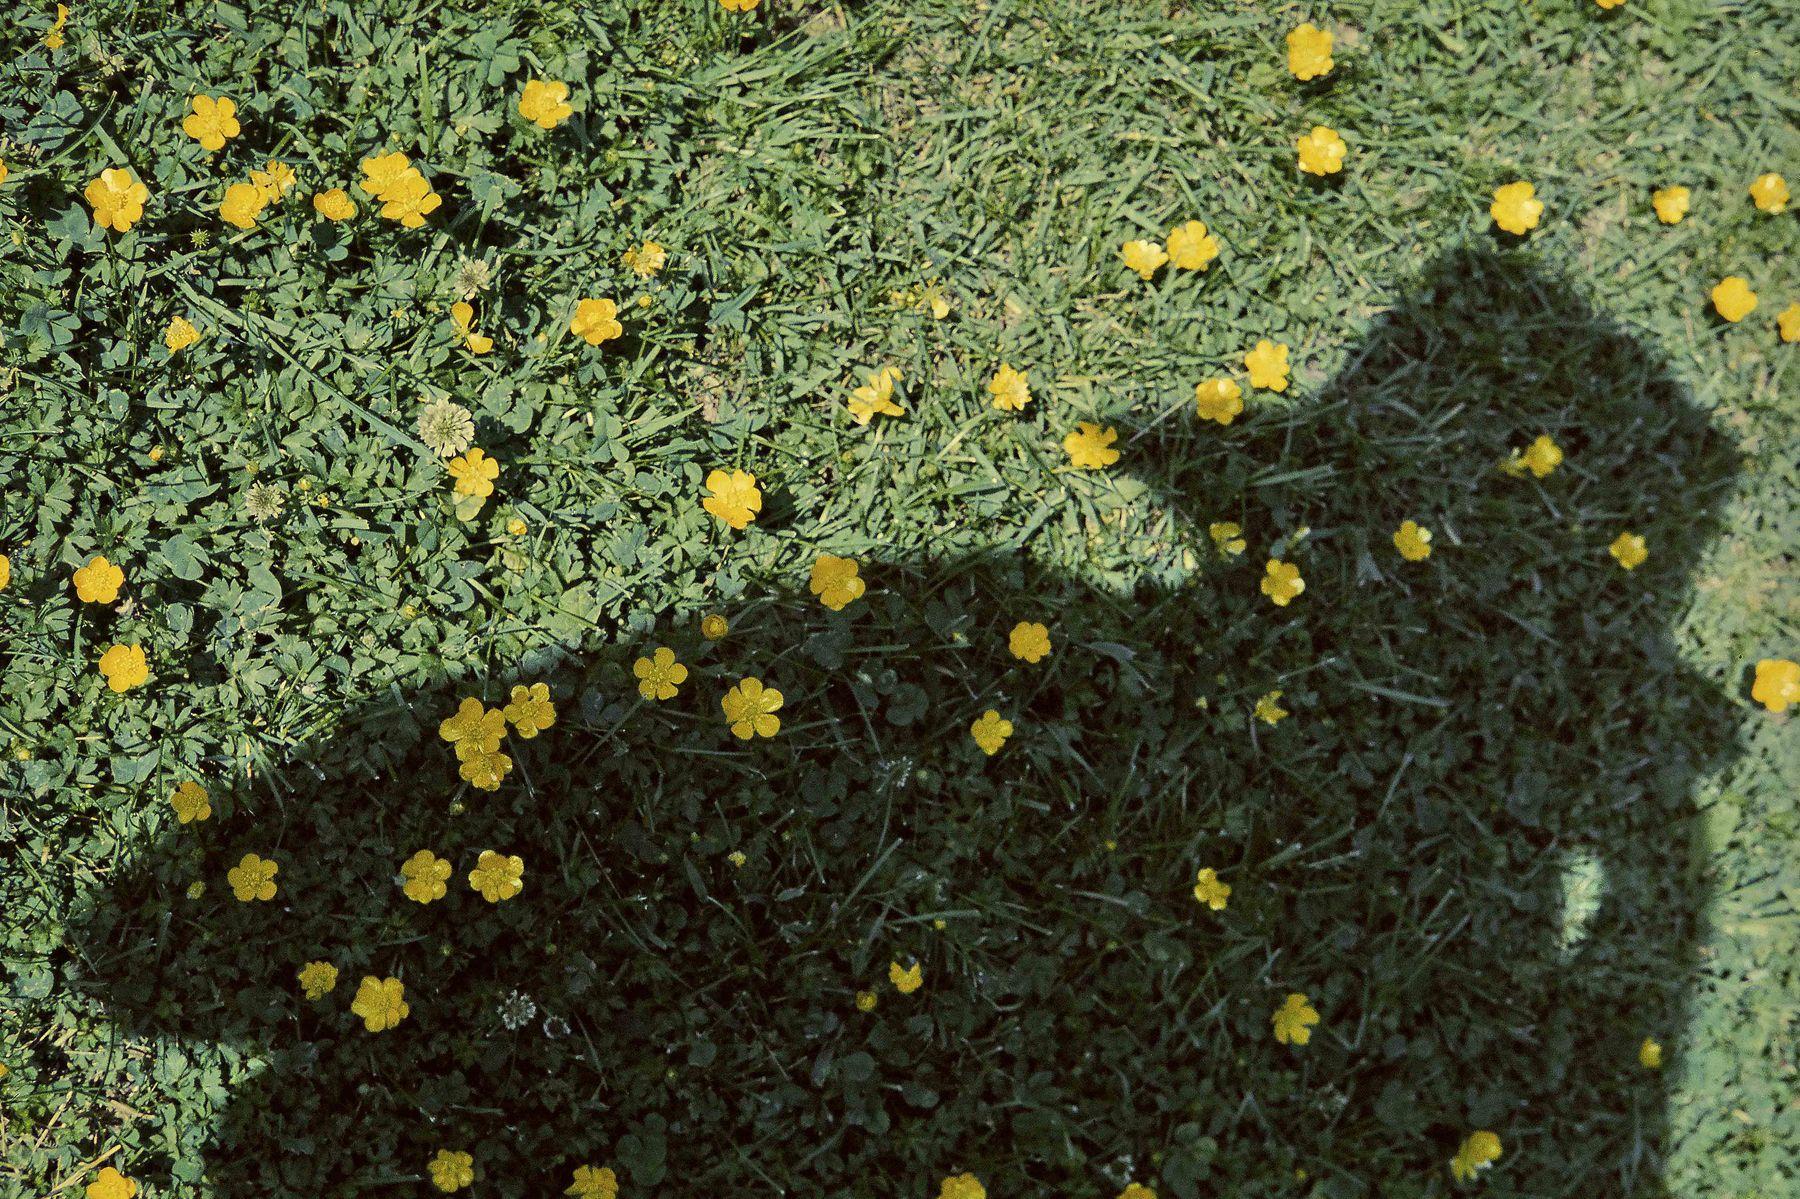 vivian-maier-new-york-howard-greenberg-1-4